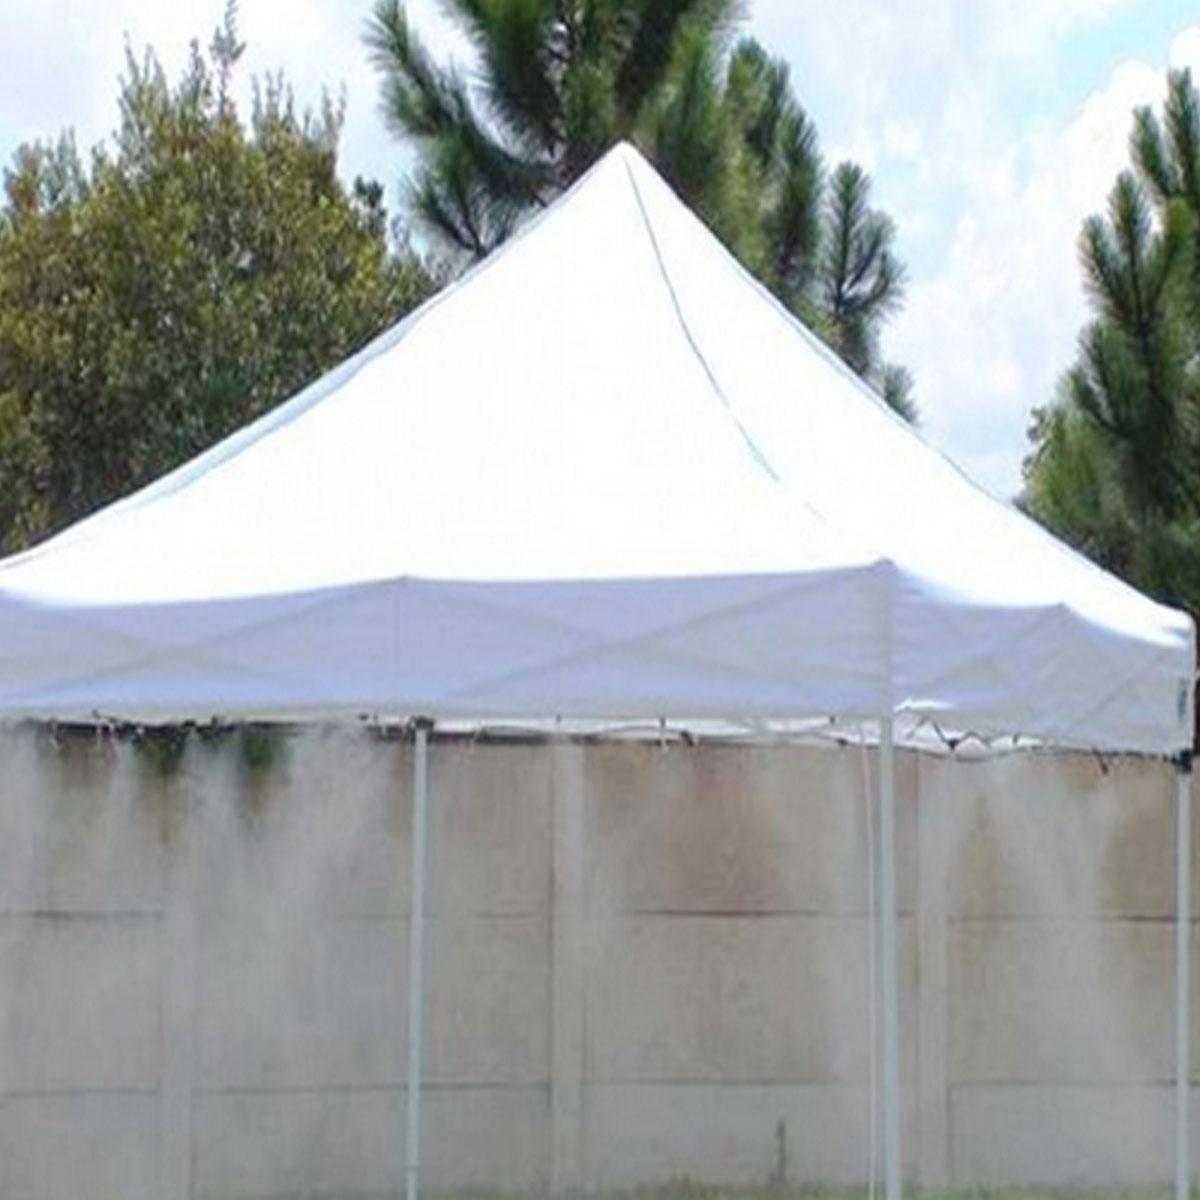 & 12VDC Mist Tent